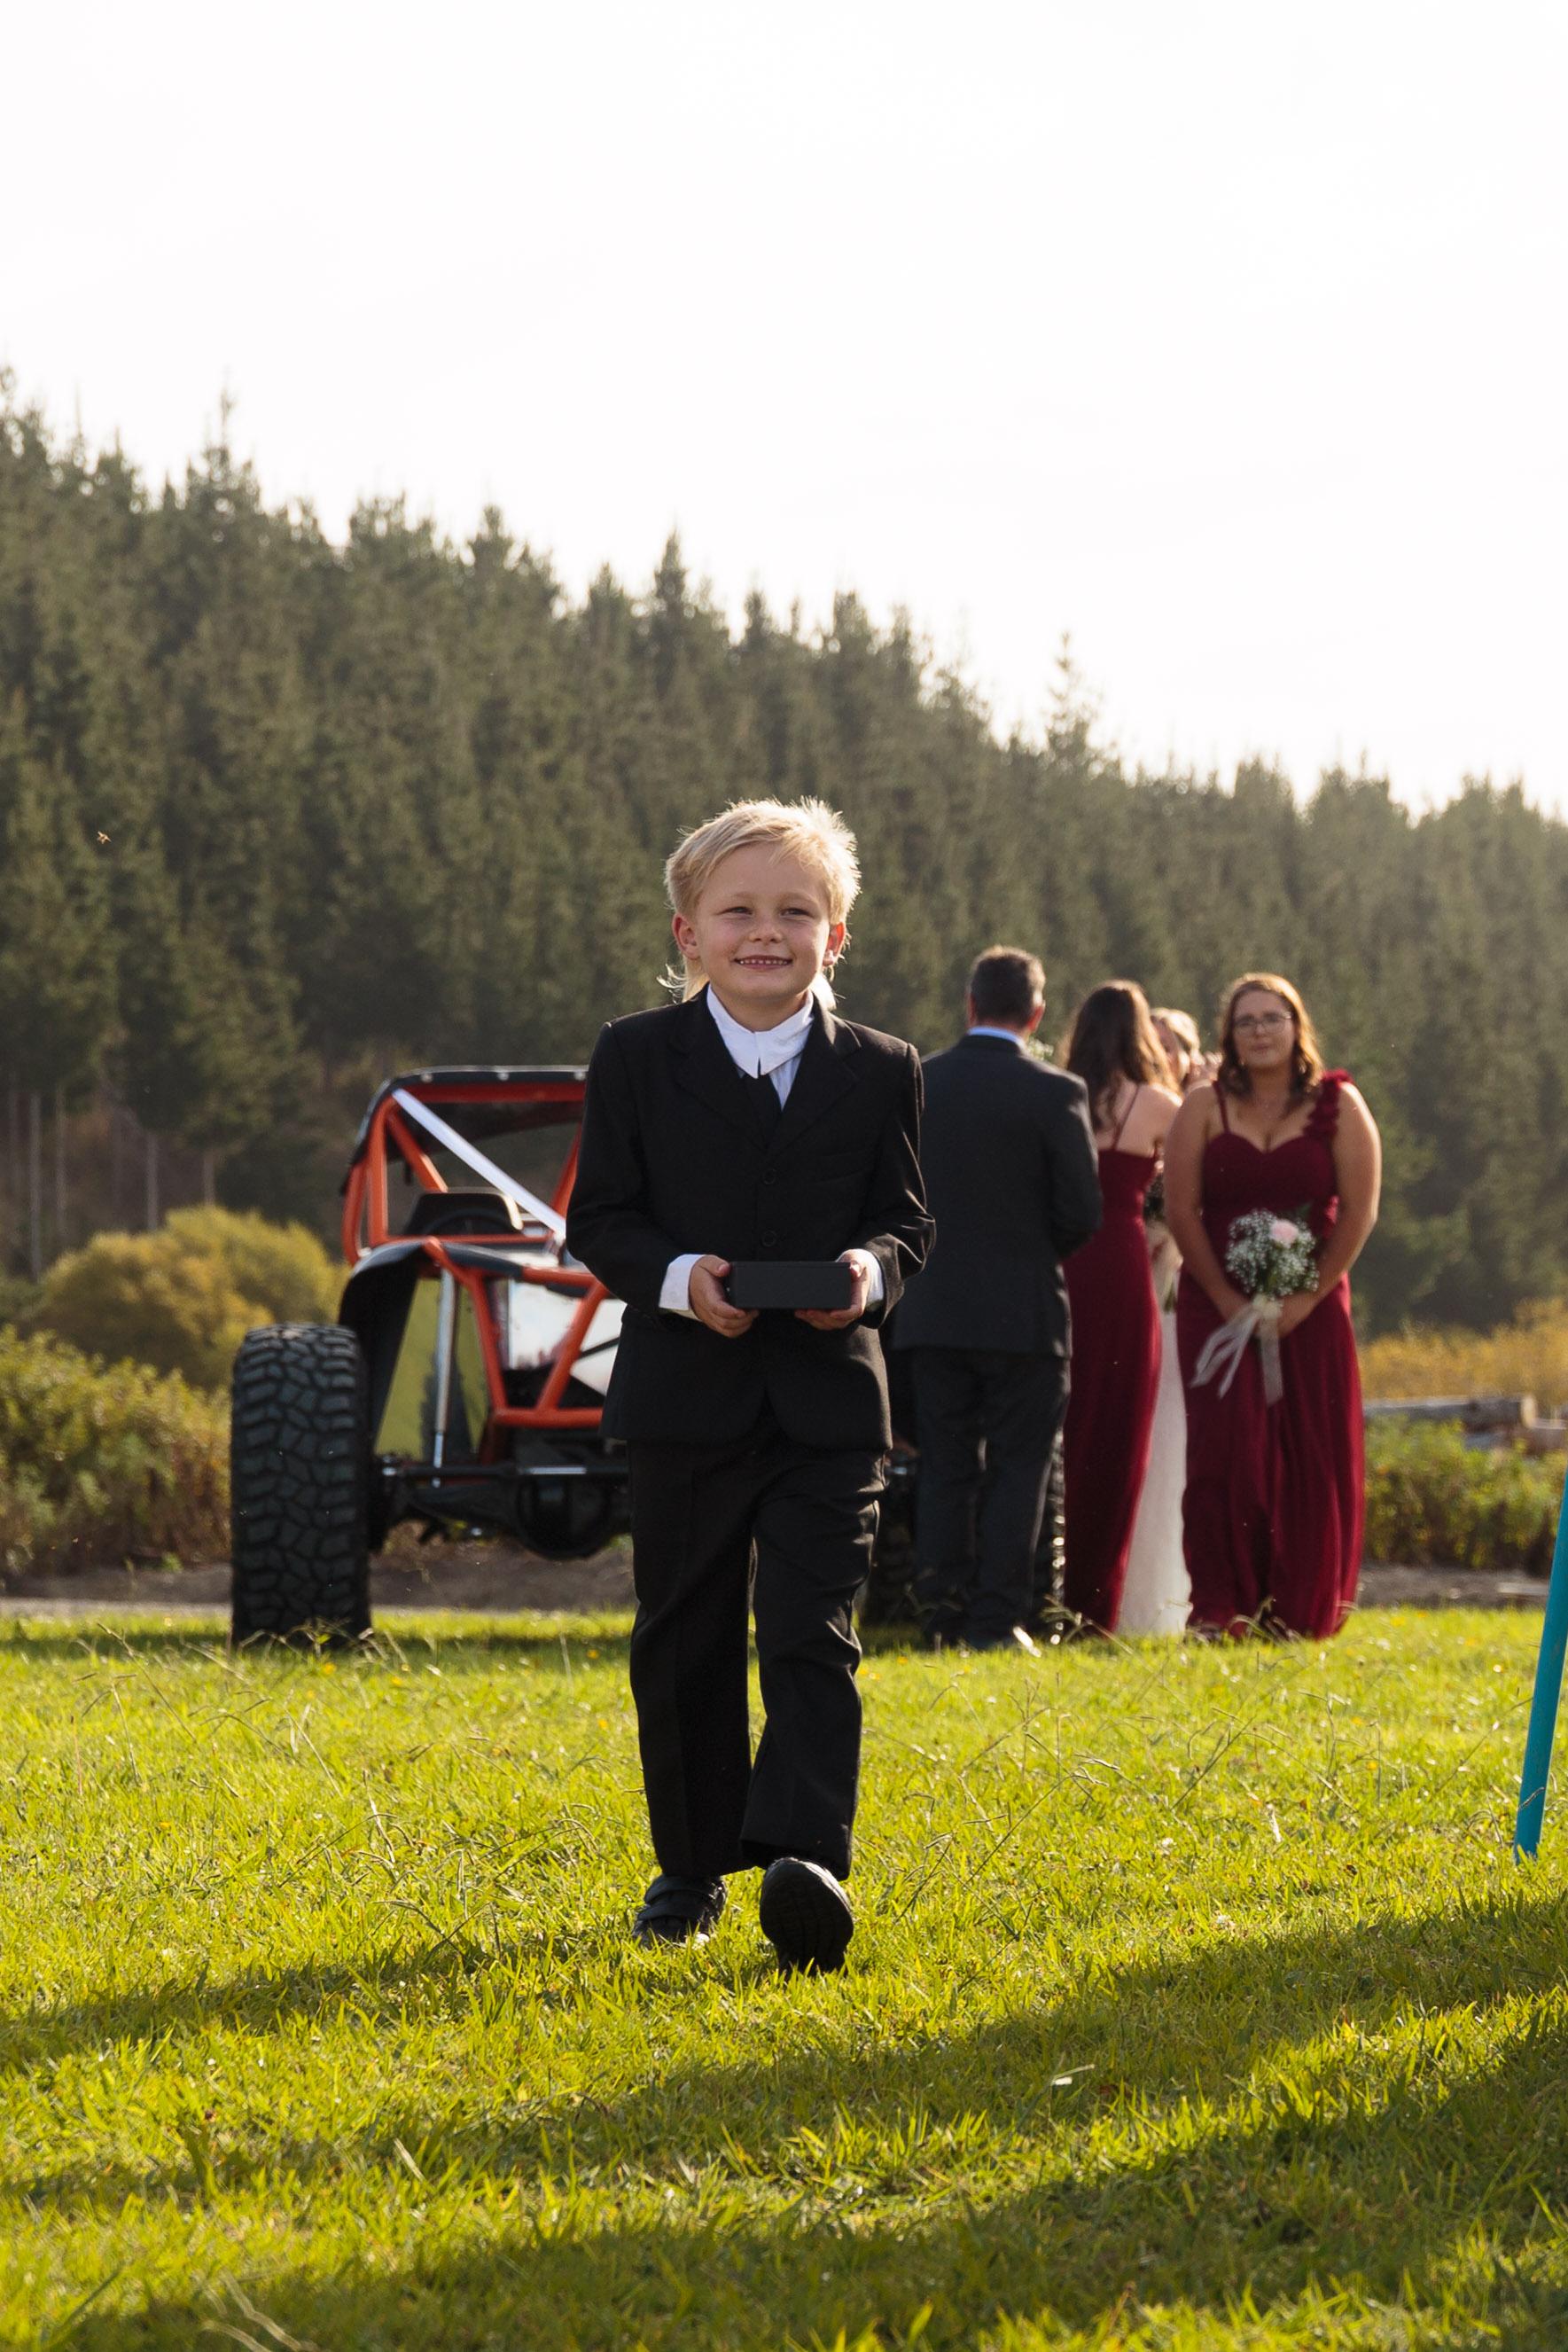 Highight-wedding-photography-dudding-lake-palmerston-north-new-zealand-28.jpg